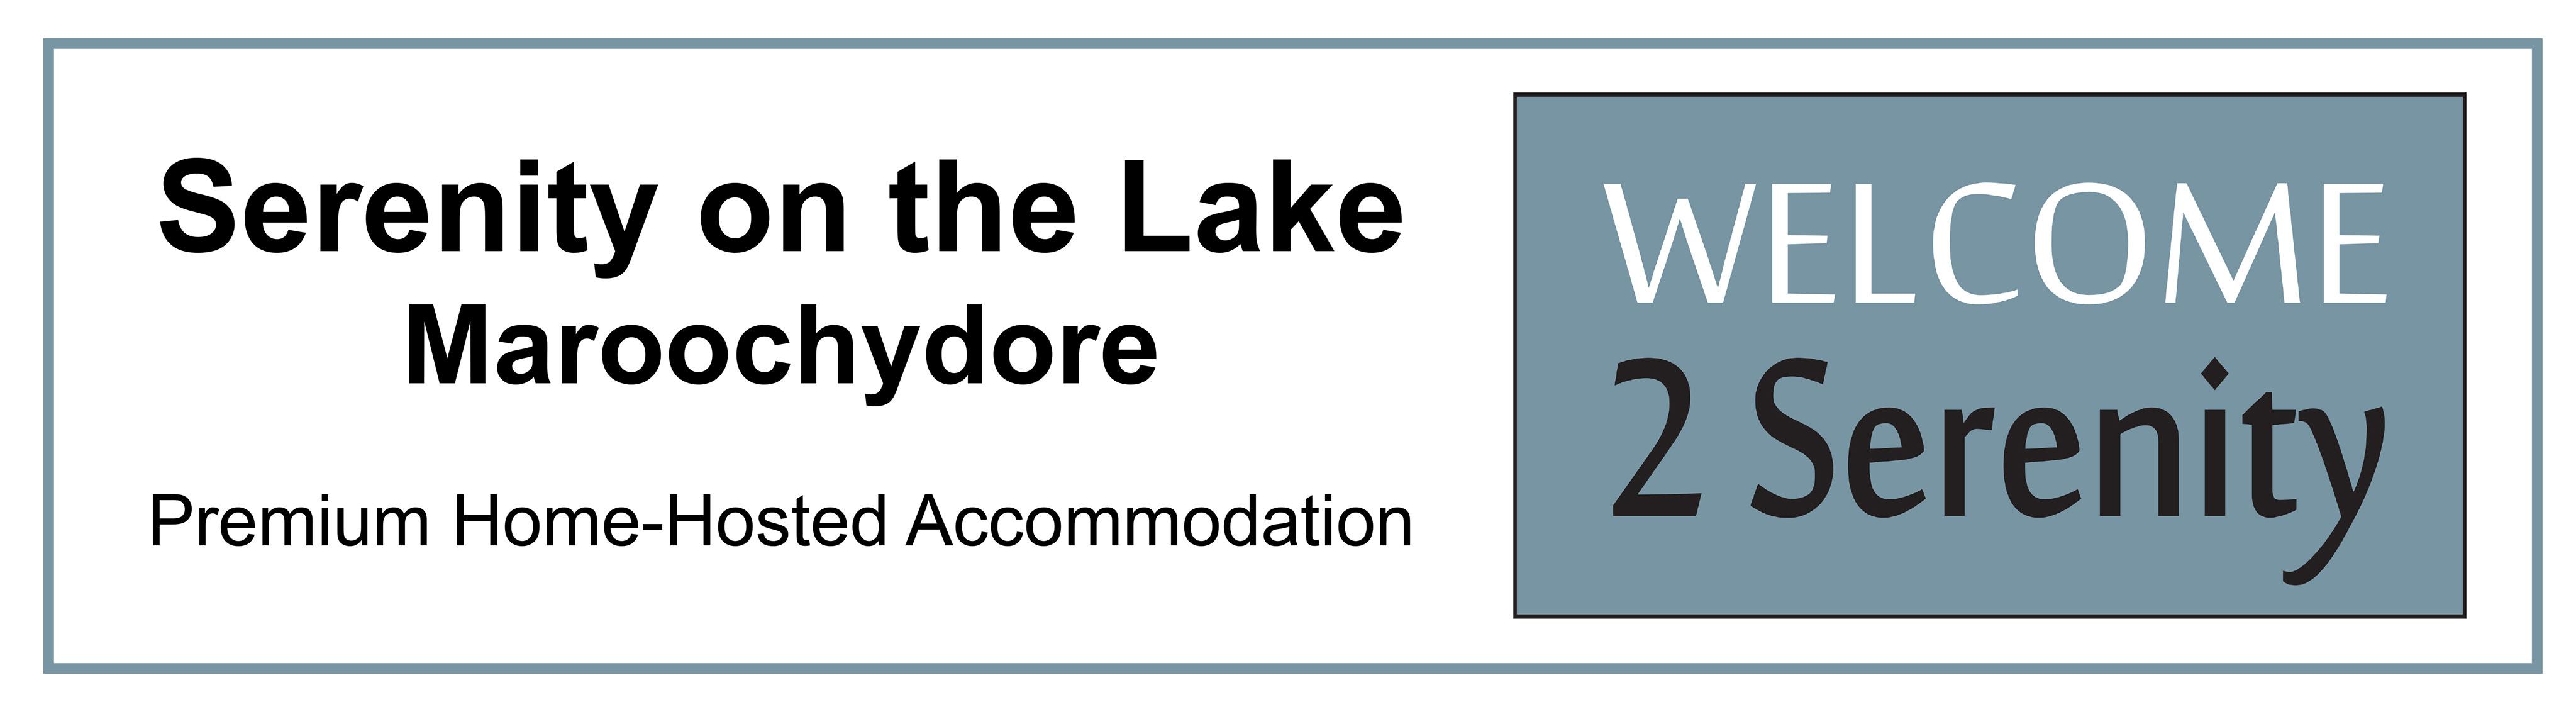 Serenity on the Lake - Maroochydore